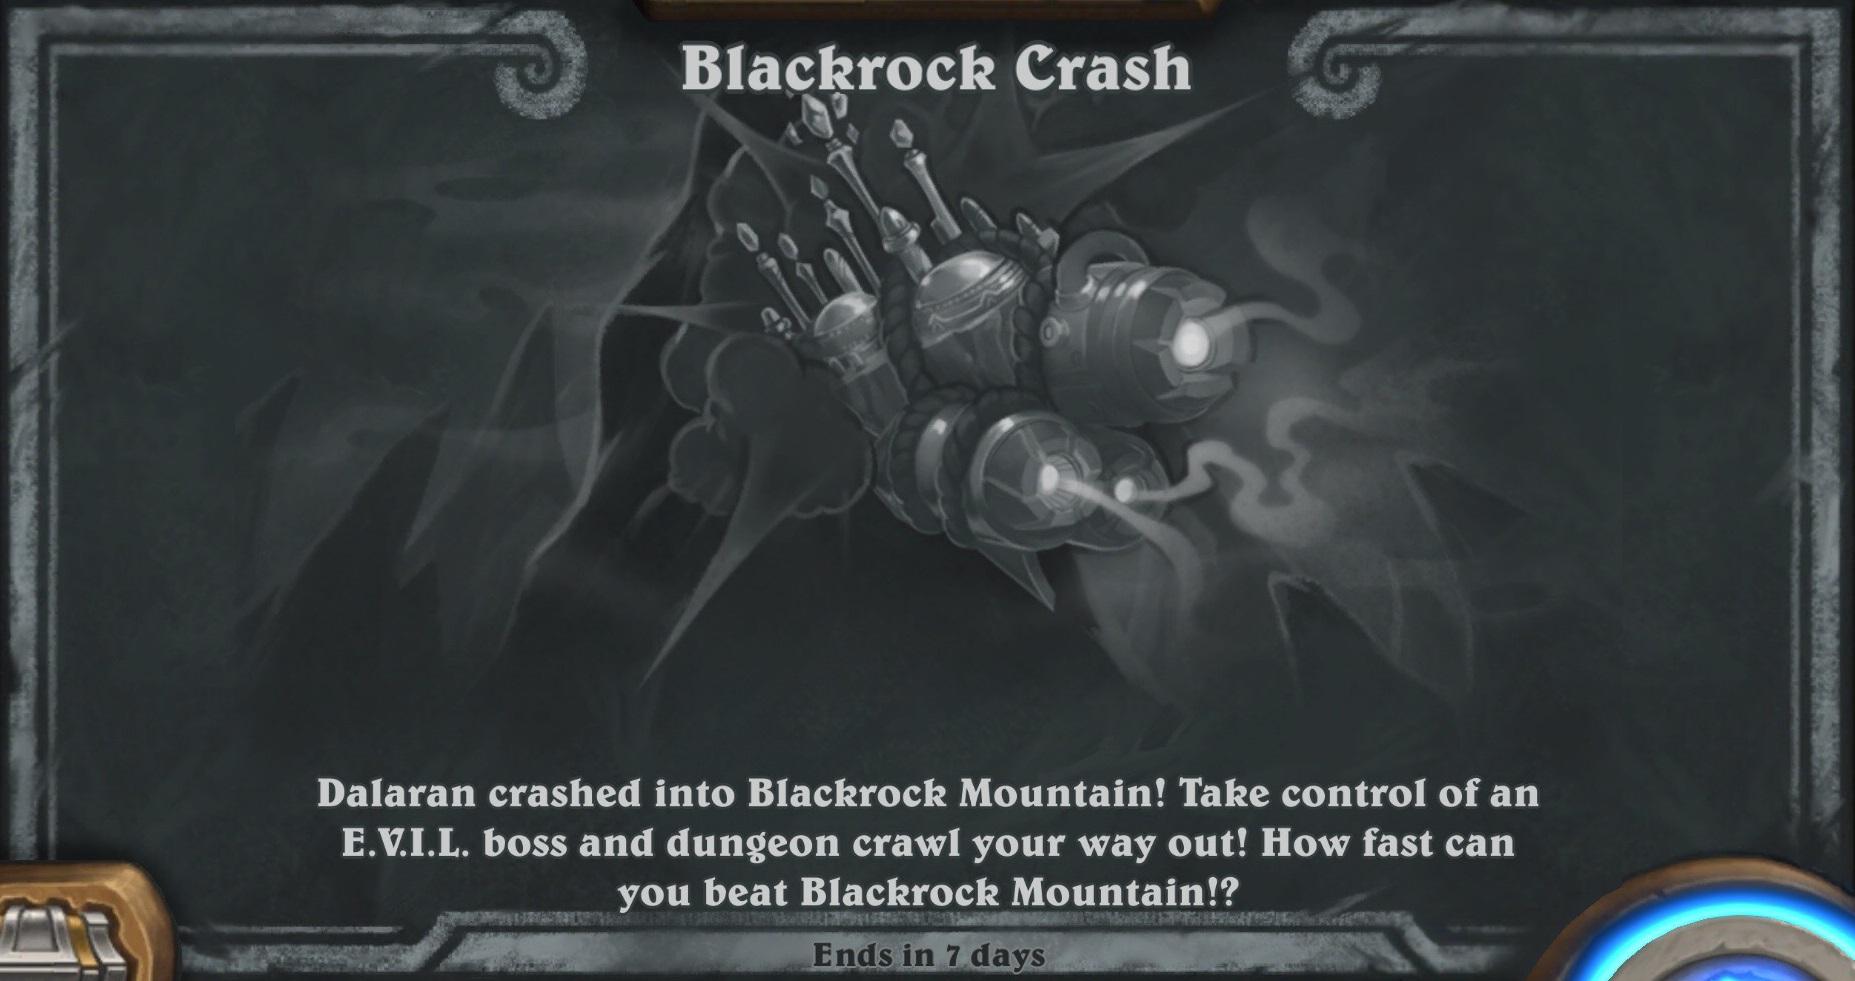 Tavern Brawl - Blackrock Crash Week 1 - Hearthstone Top Decks